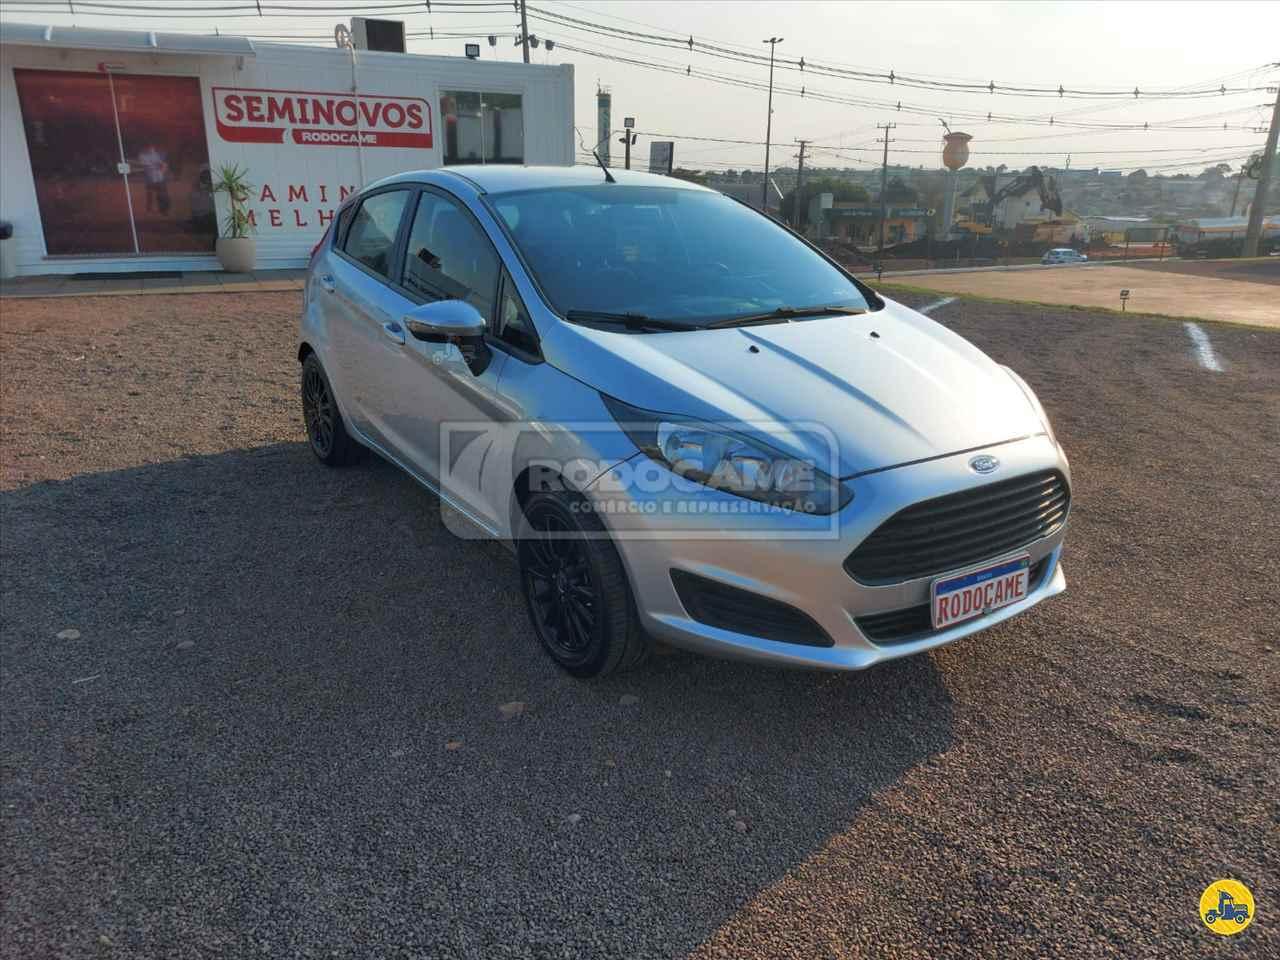 CARRO FORD Fiesta S 1.6 SE Rodocame - Facchini CASCAVEL PARANÁ PR